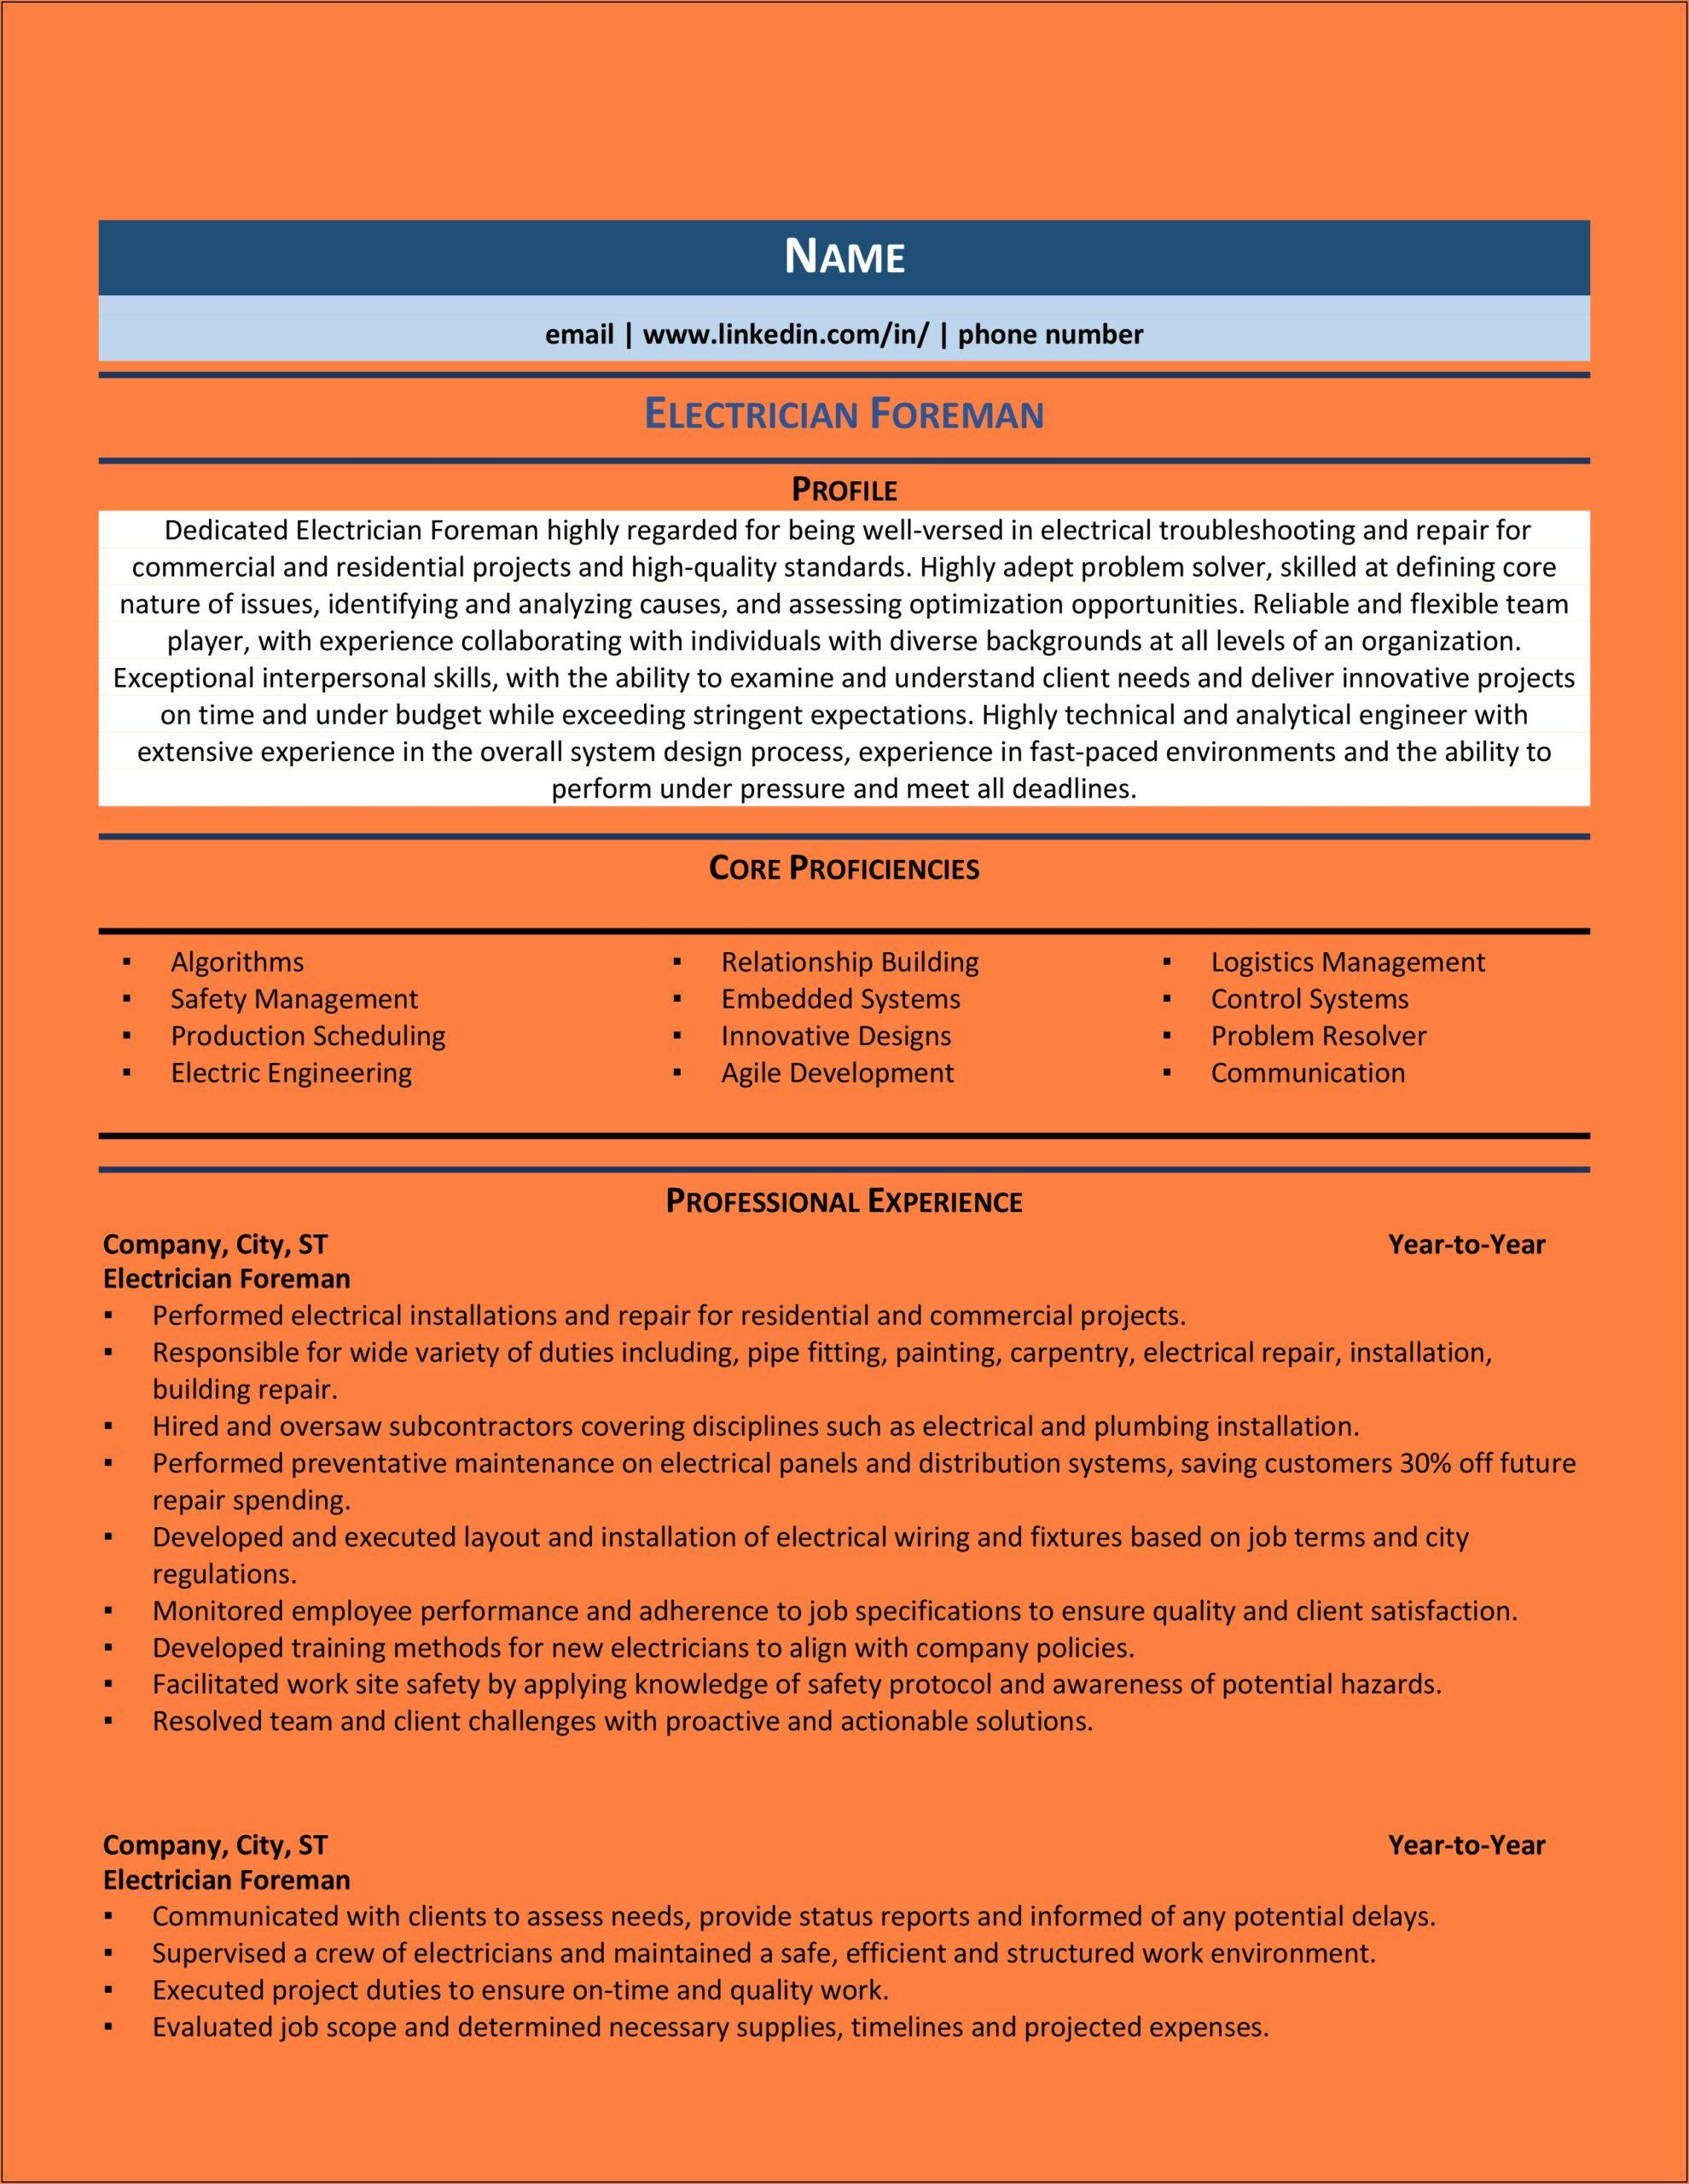 Electrical Foreman Resume Sample